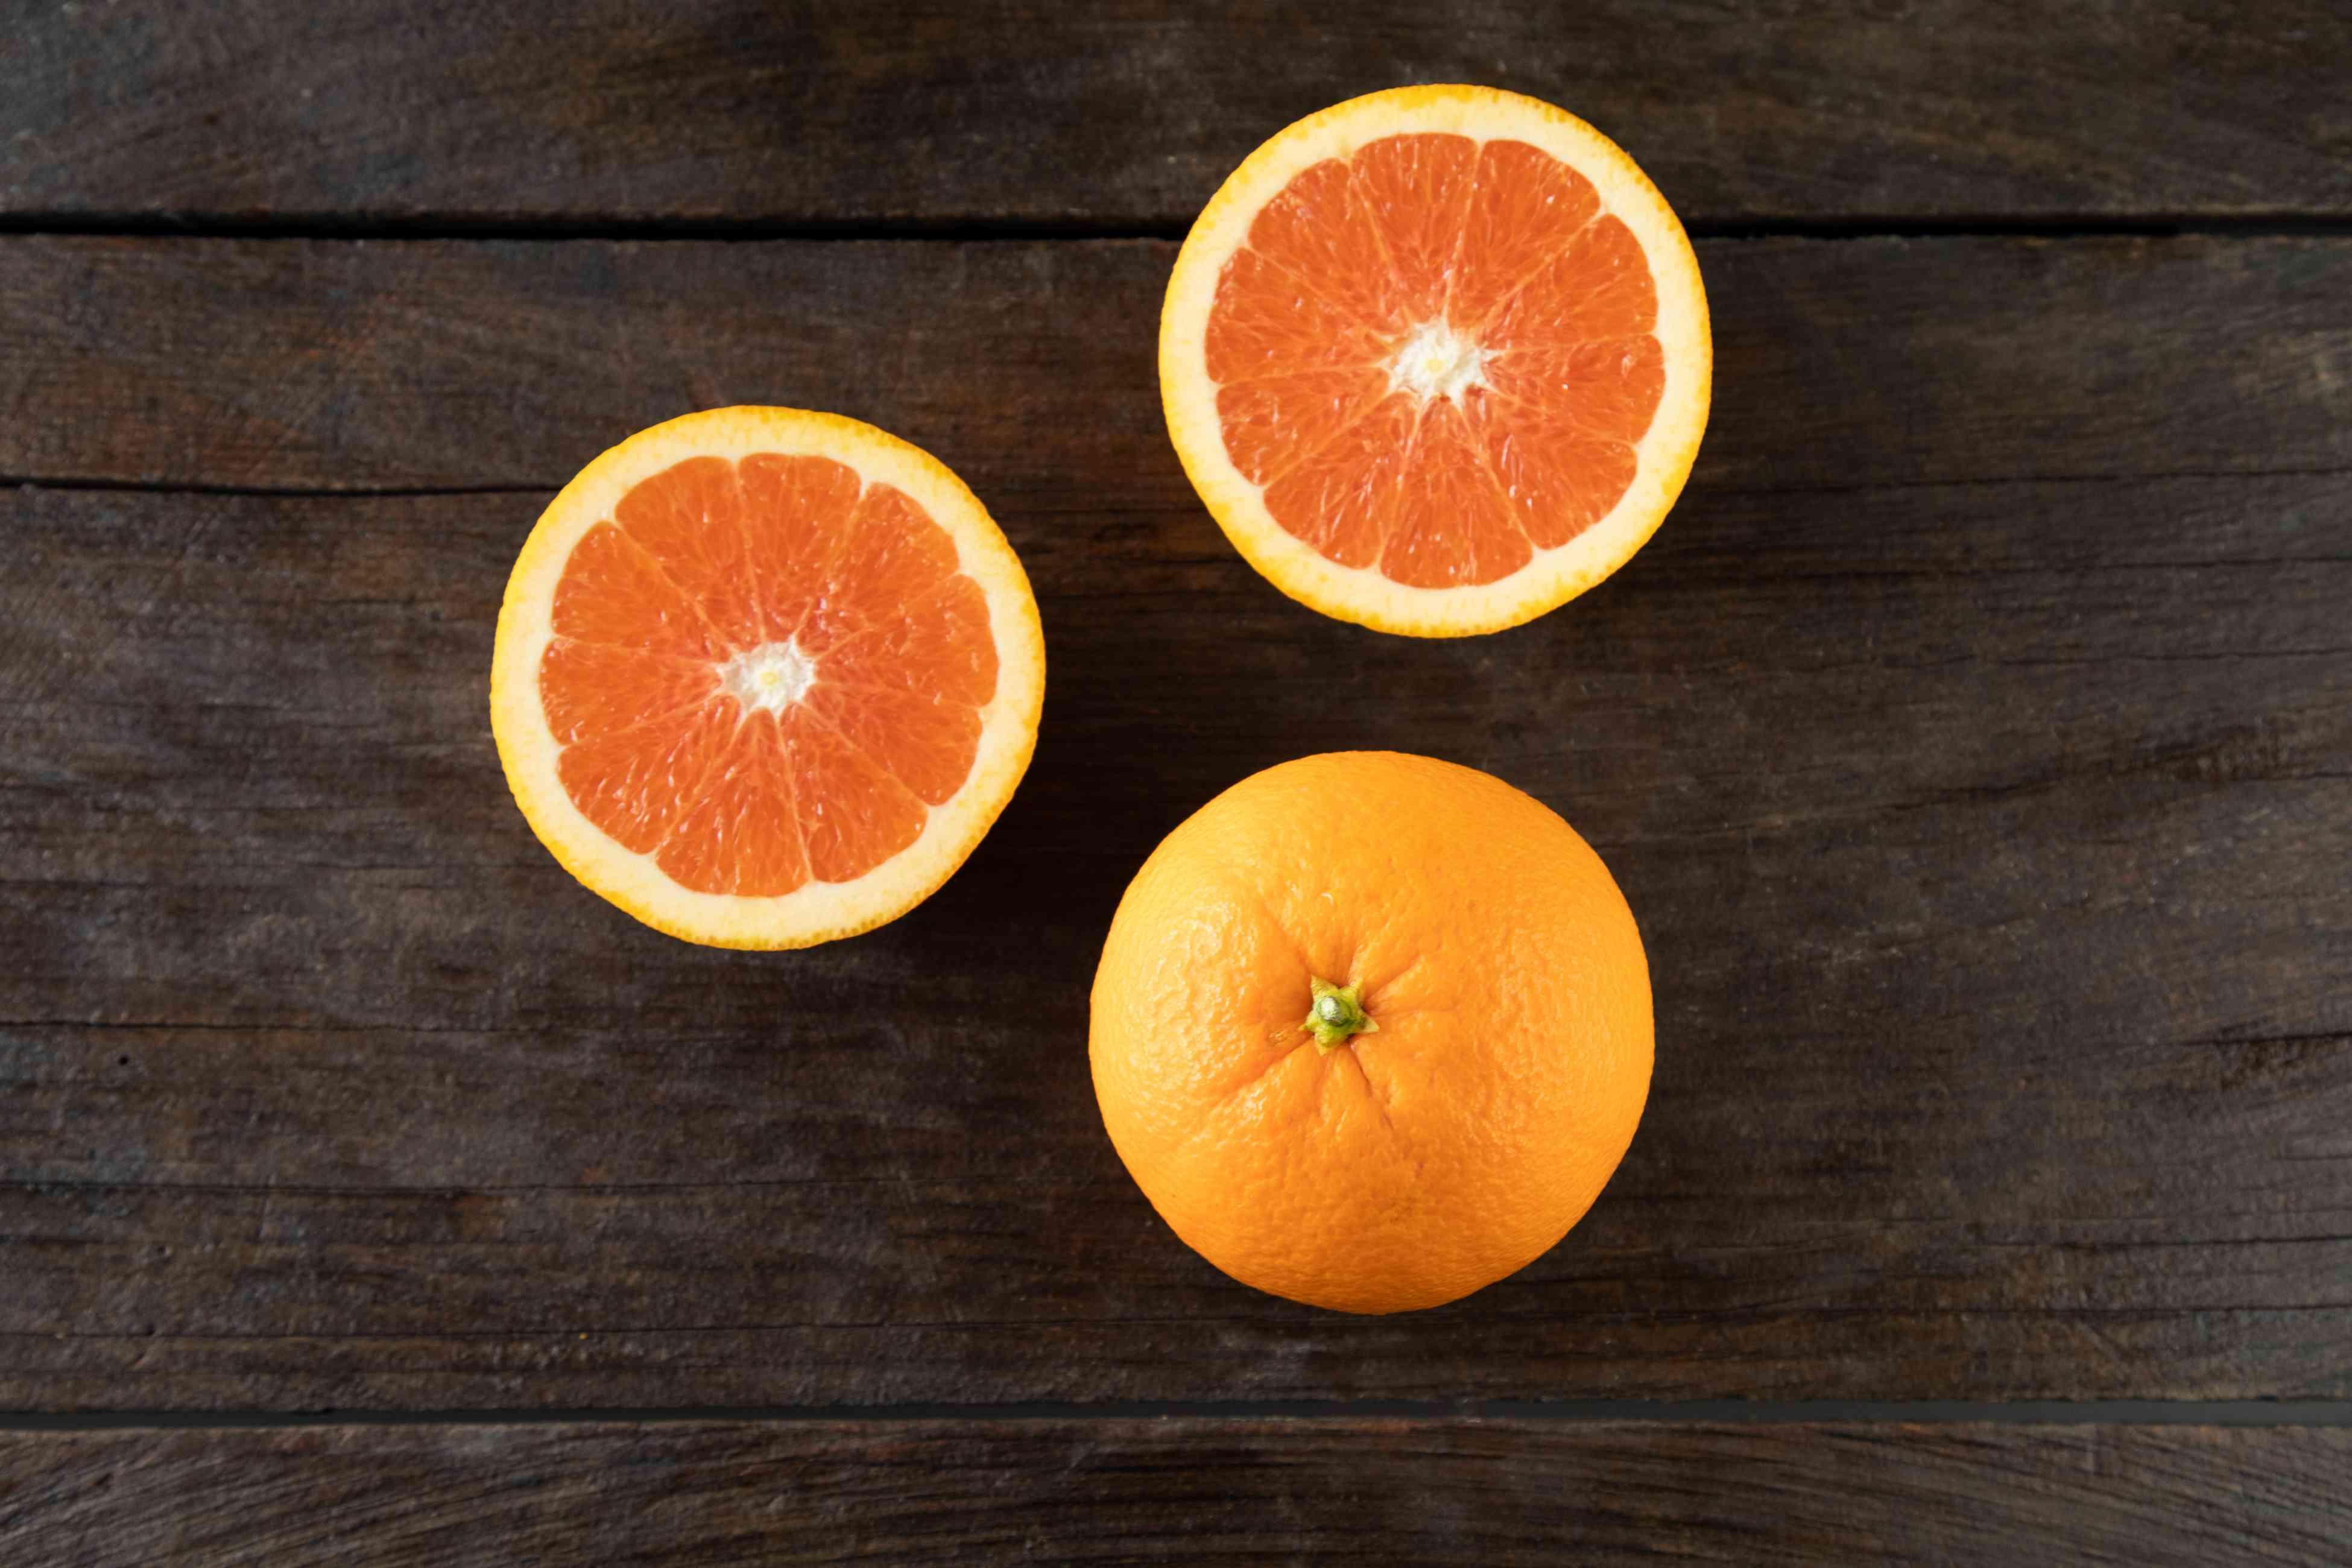 Cara Cara oranges on dark background